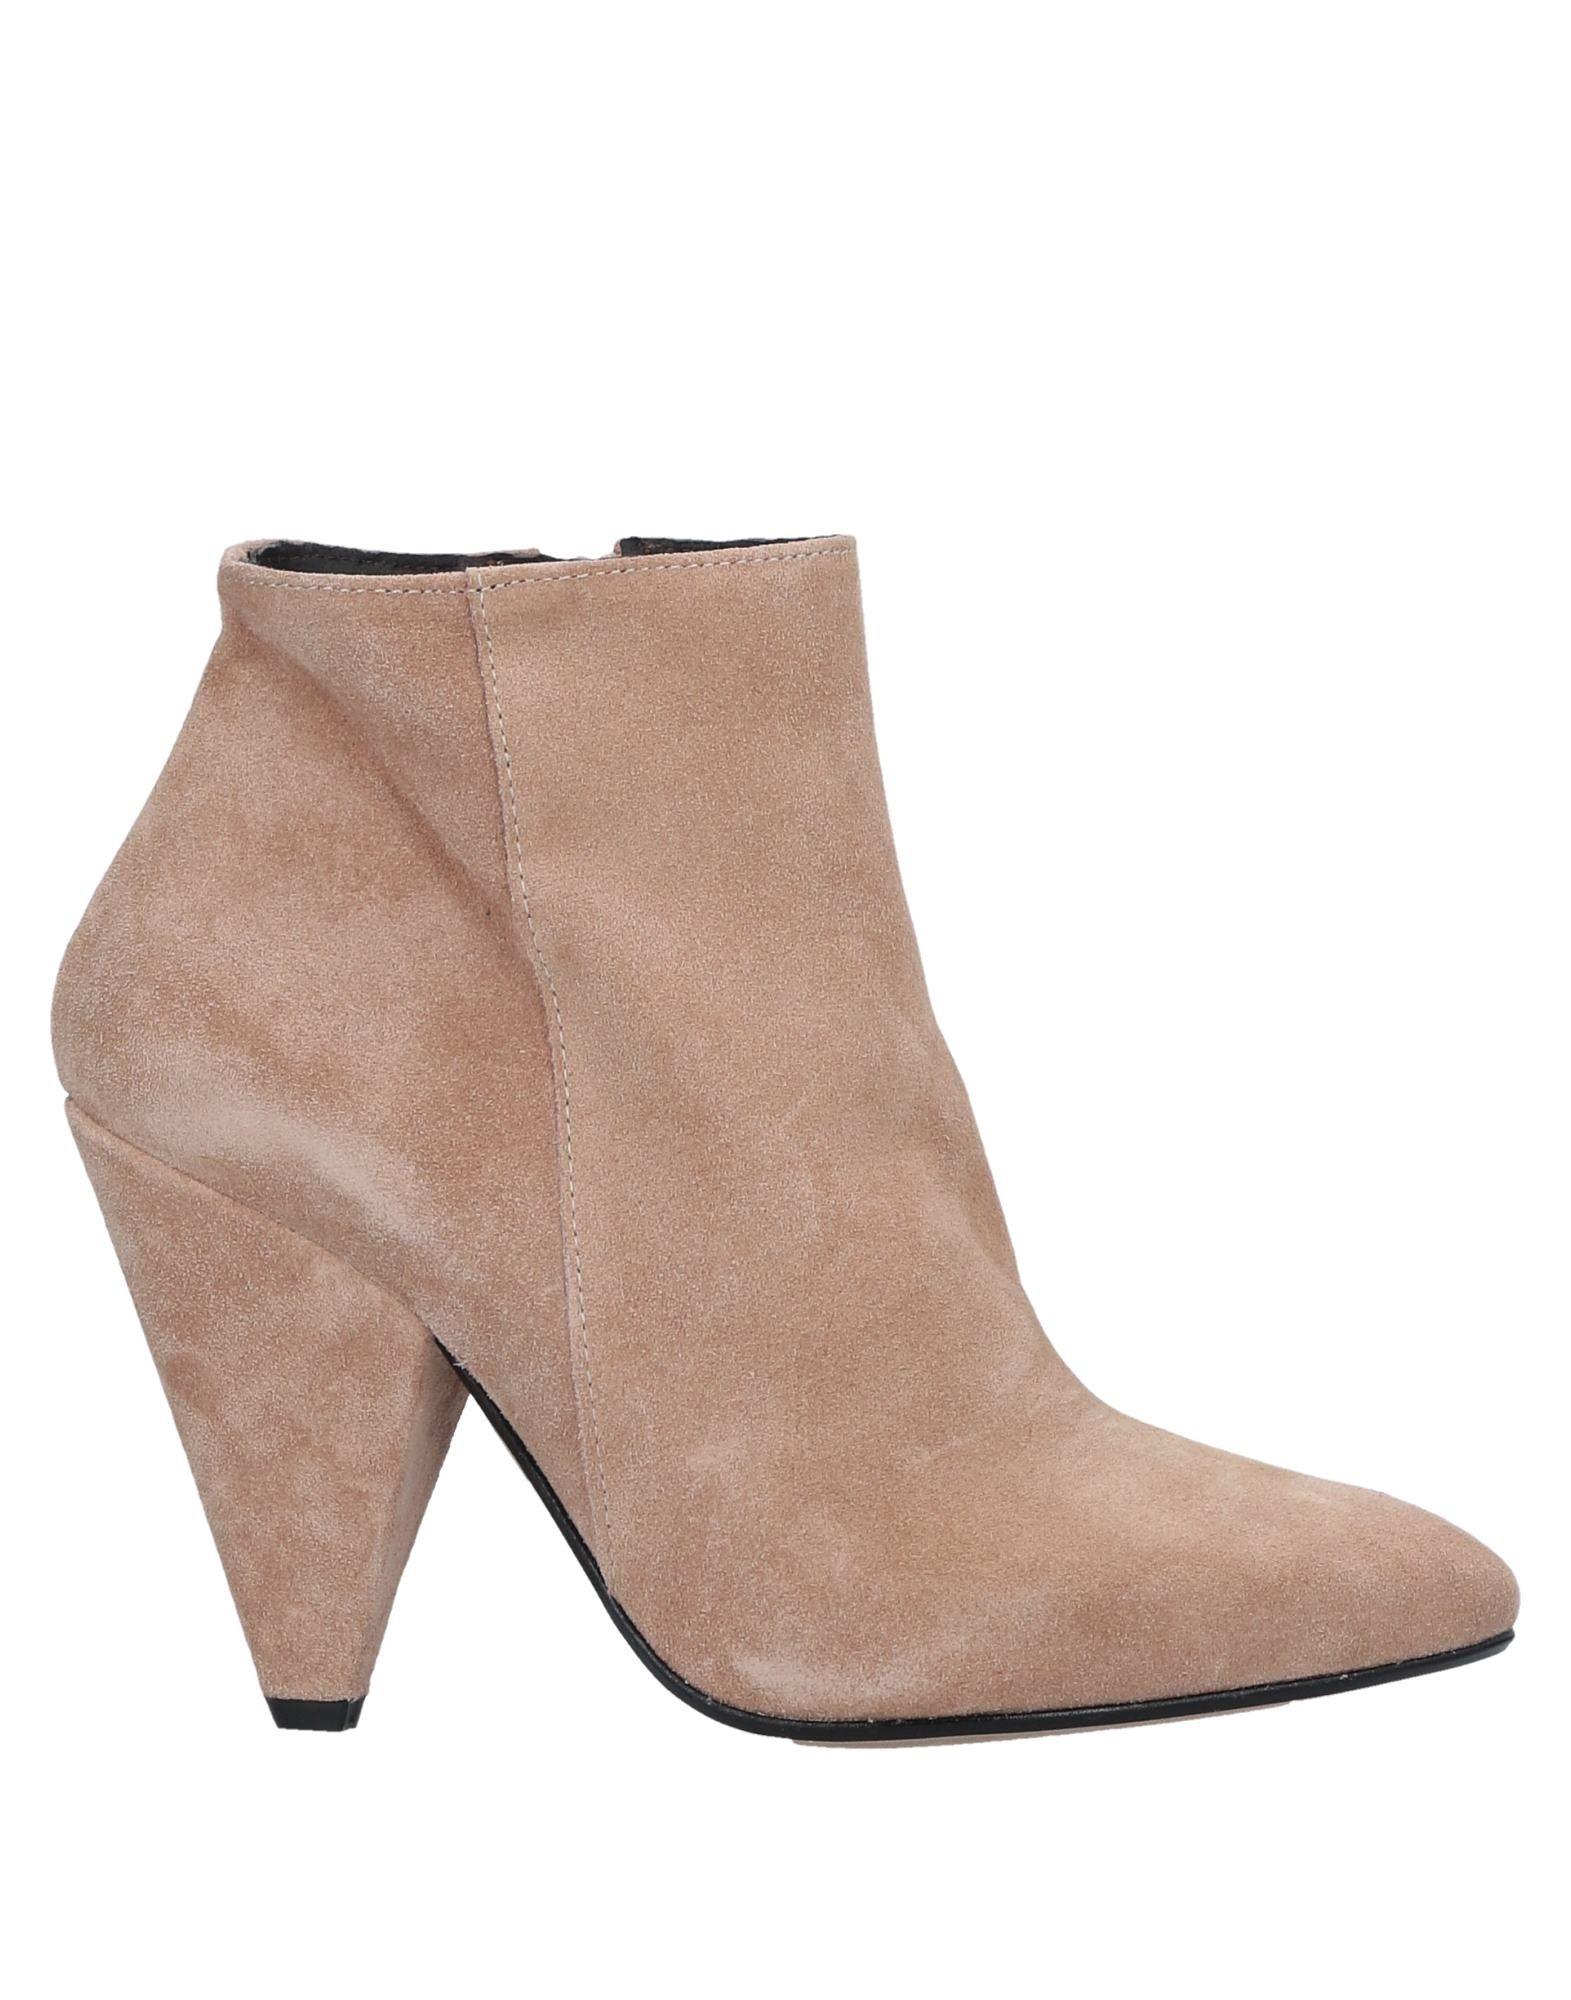 Moda Stivaletti Unlace Donna - 11528391MQ